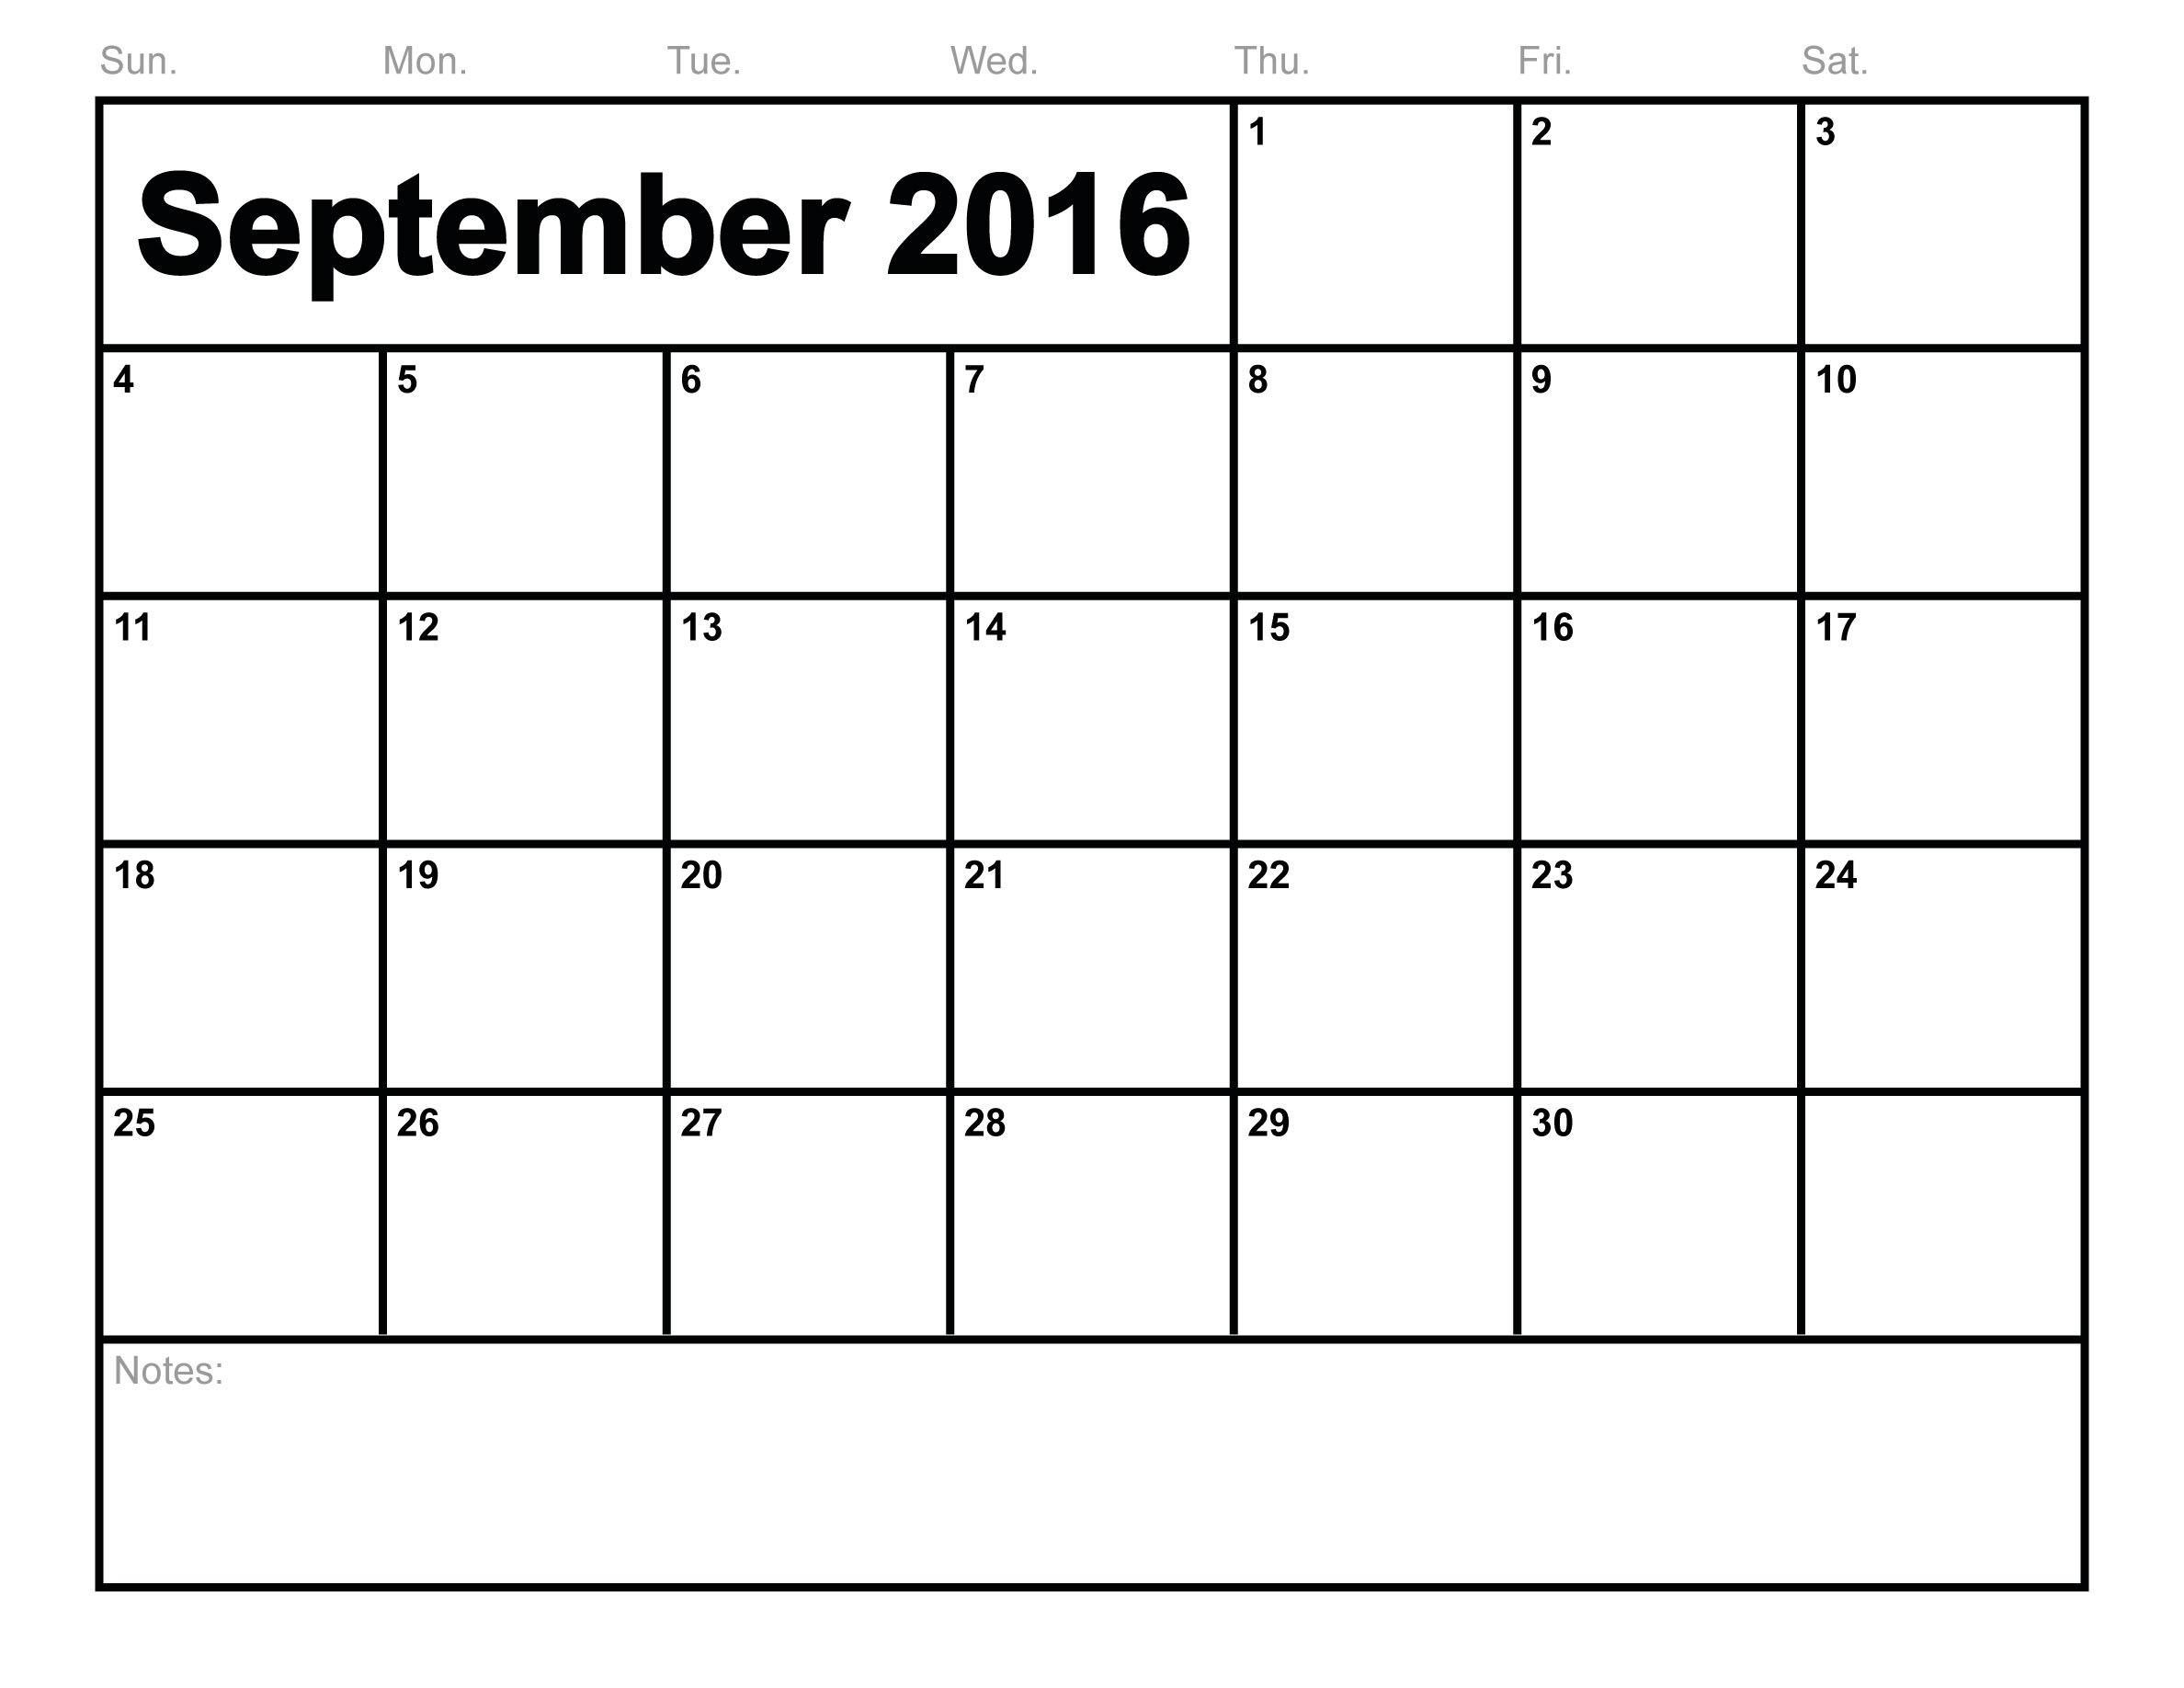 2018 September Printable Calendar Free, Blank Templates Pdf within Blank Printable Calendars December